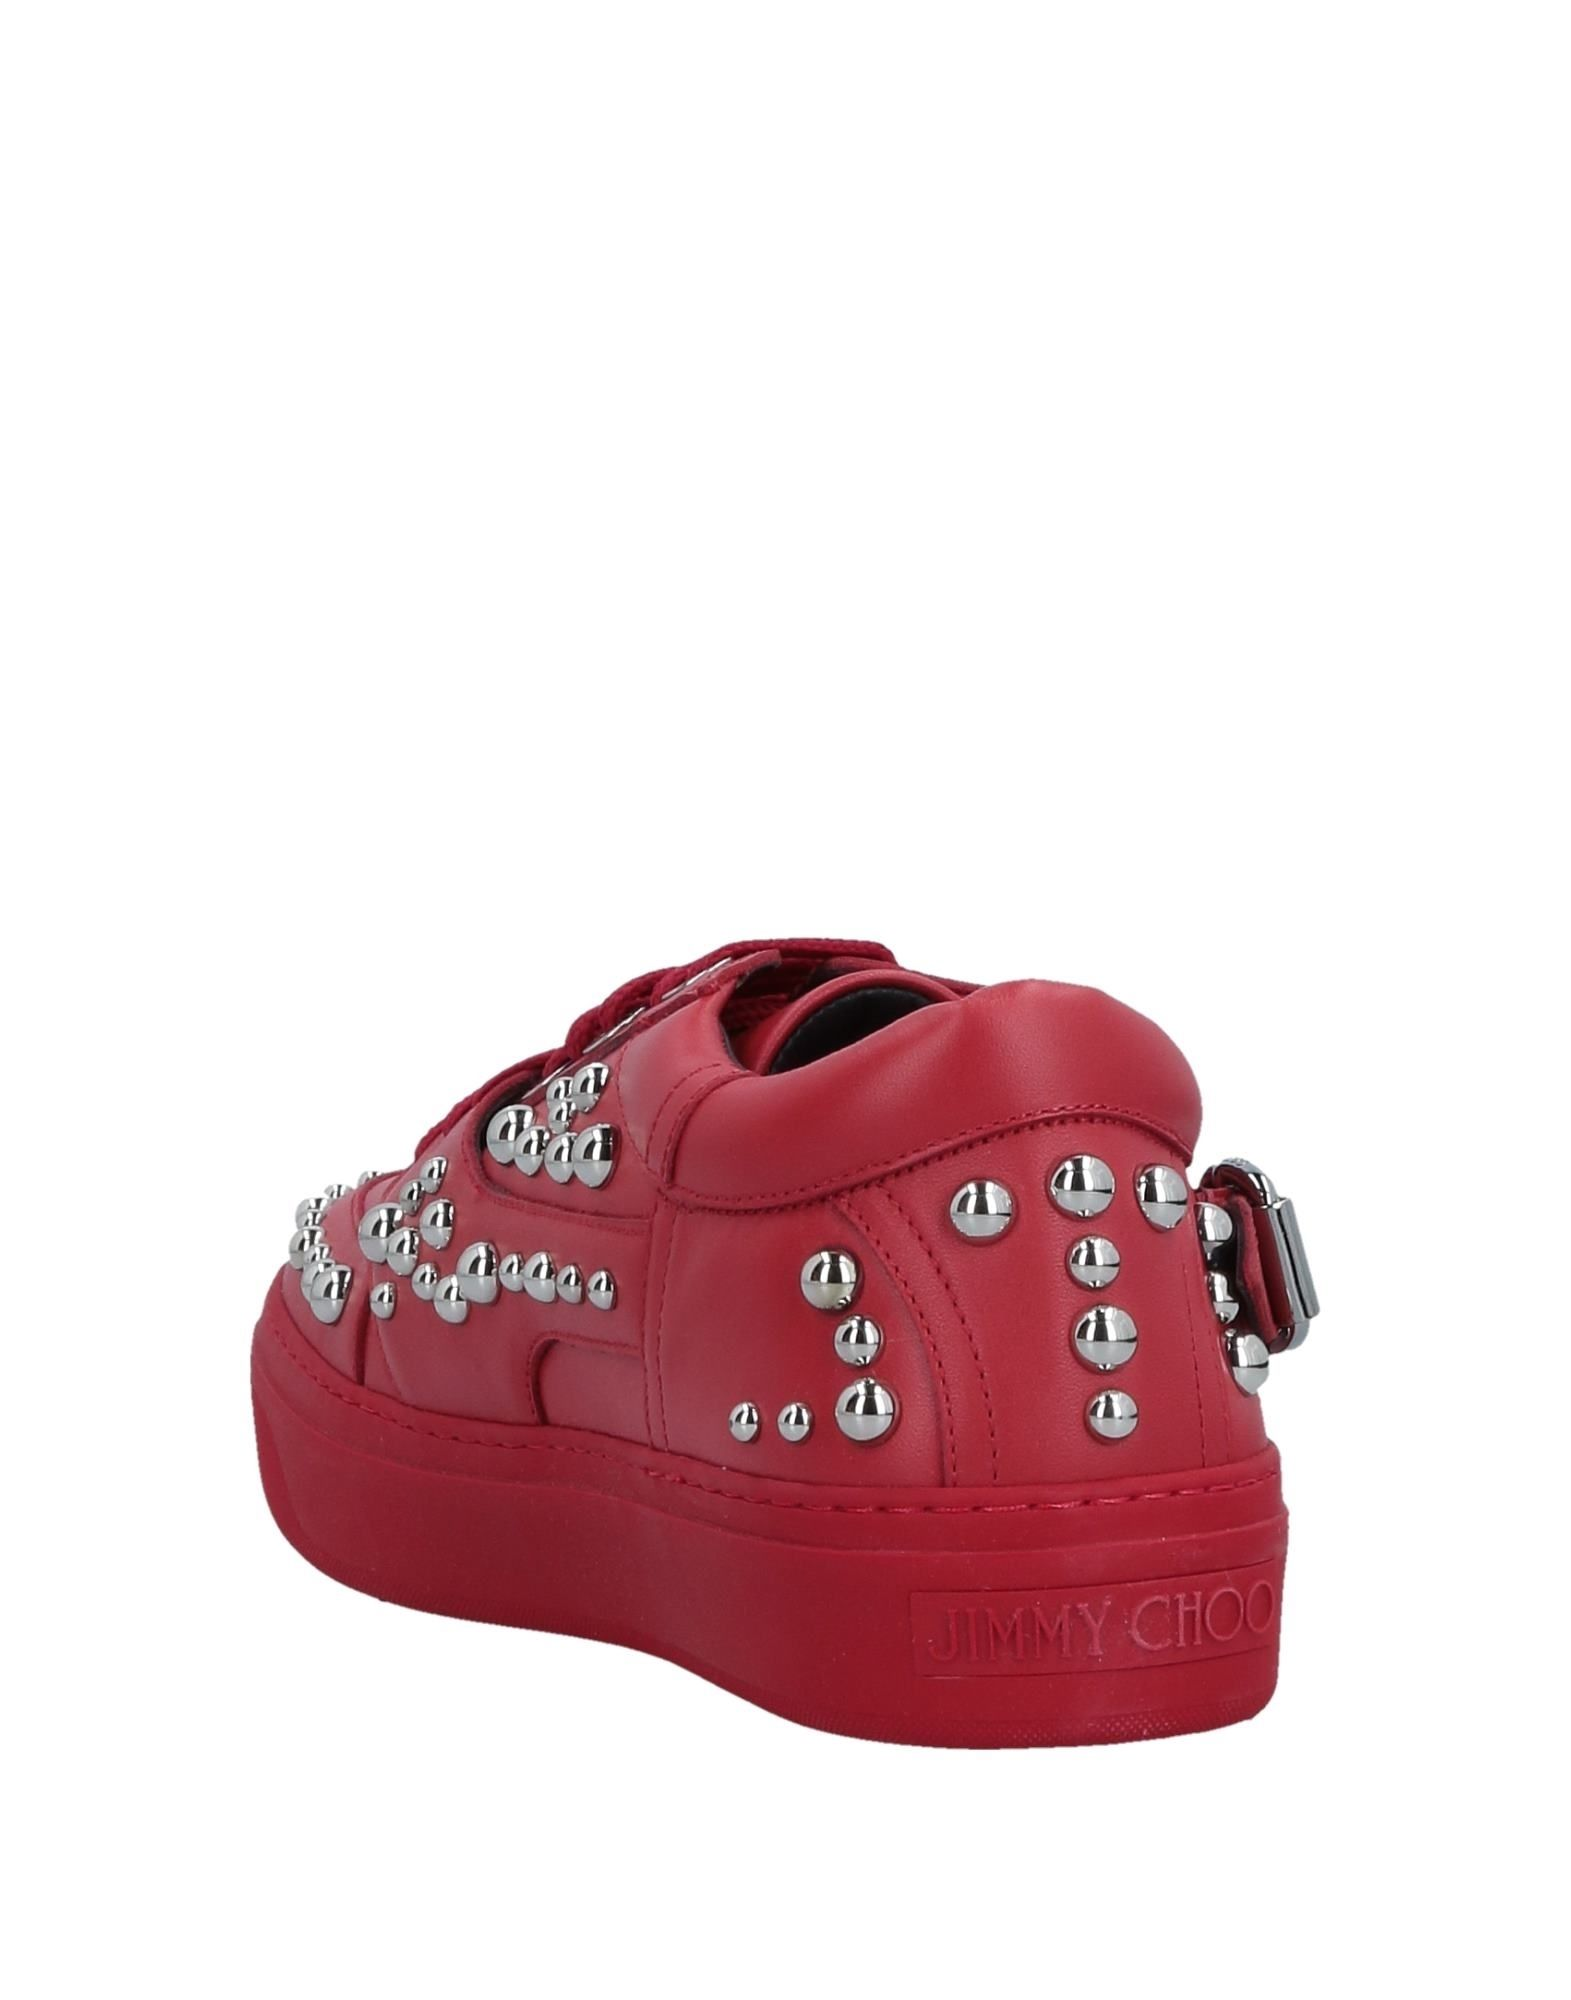 Jimmy Choo Sneakers Qualität Herren  11515639VO Gute Qualität Sneakers beliebte Schuhe 0eb4a2